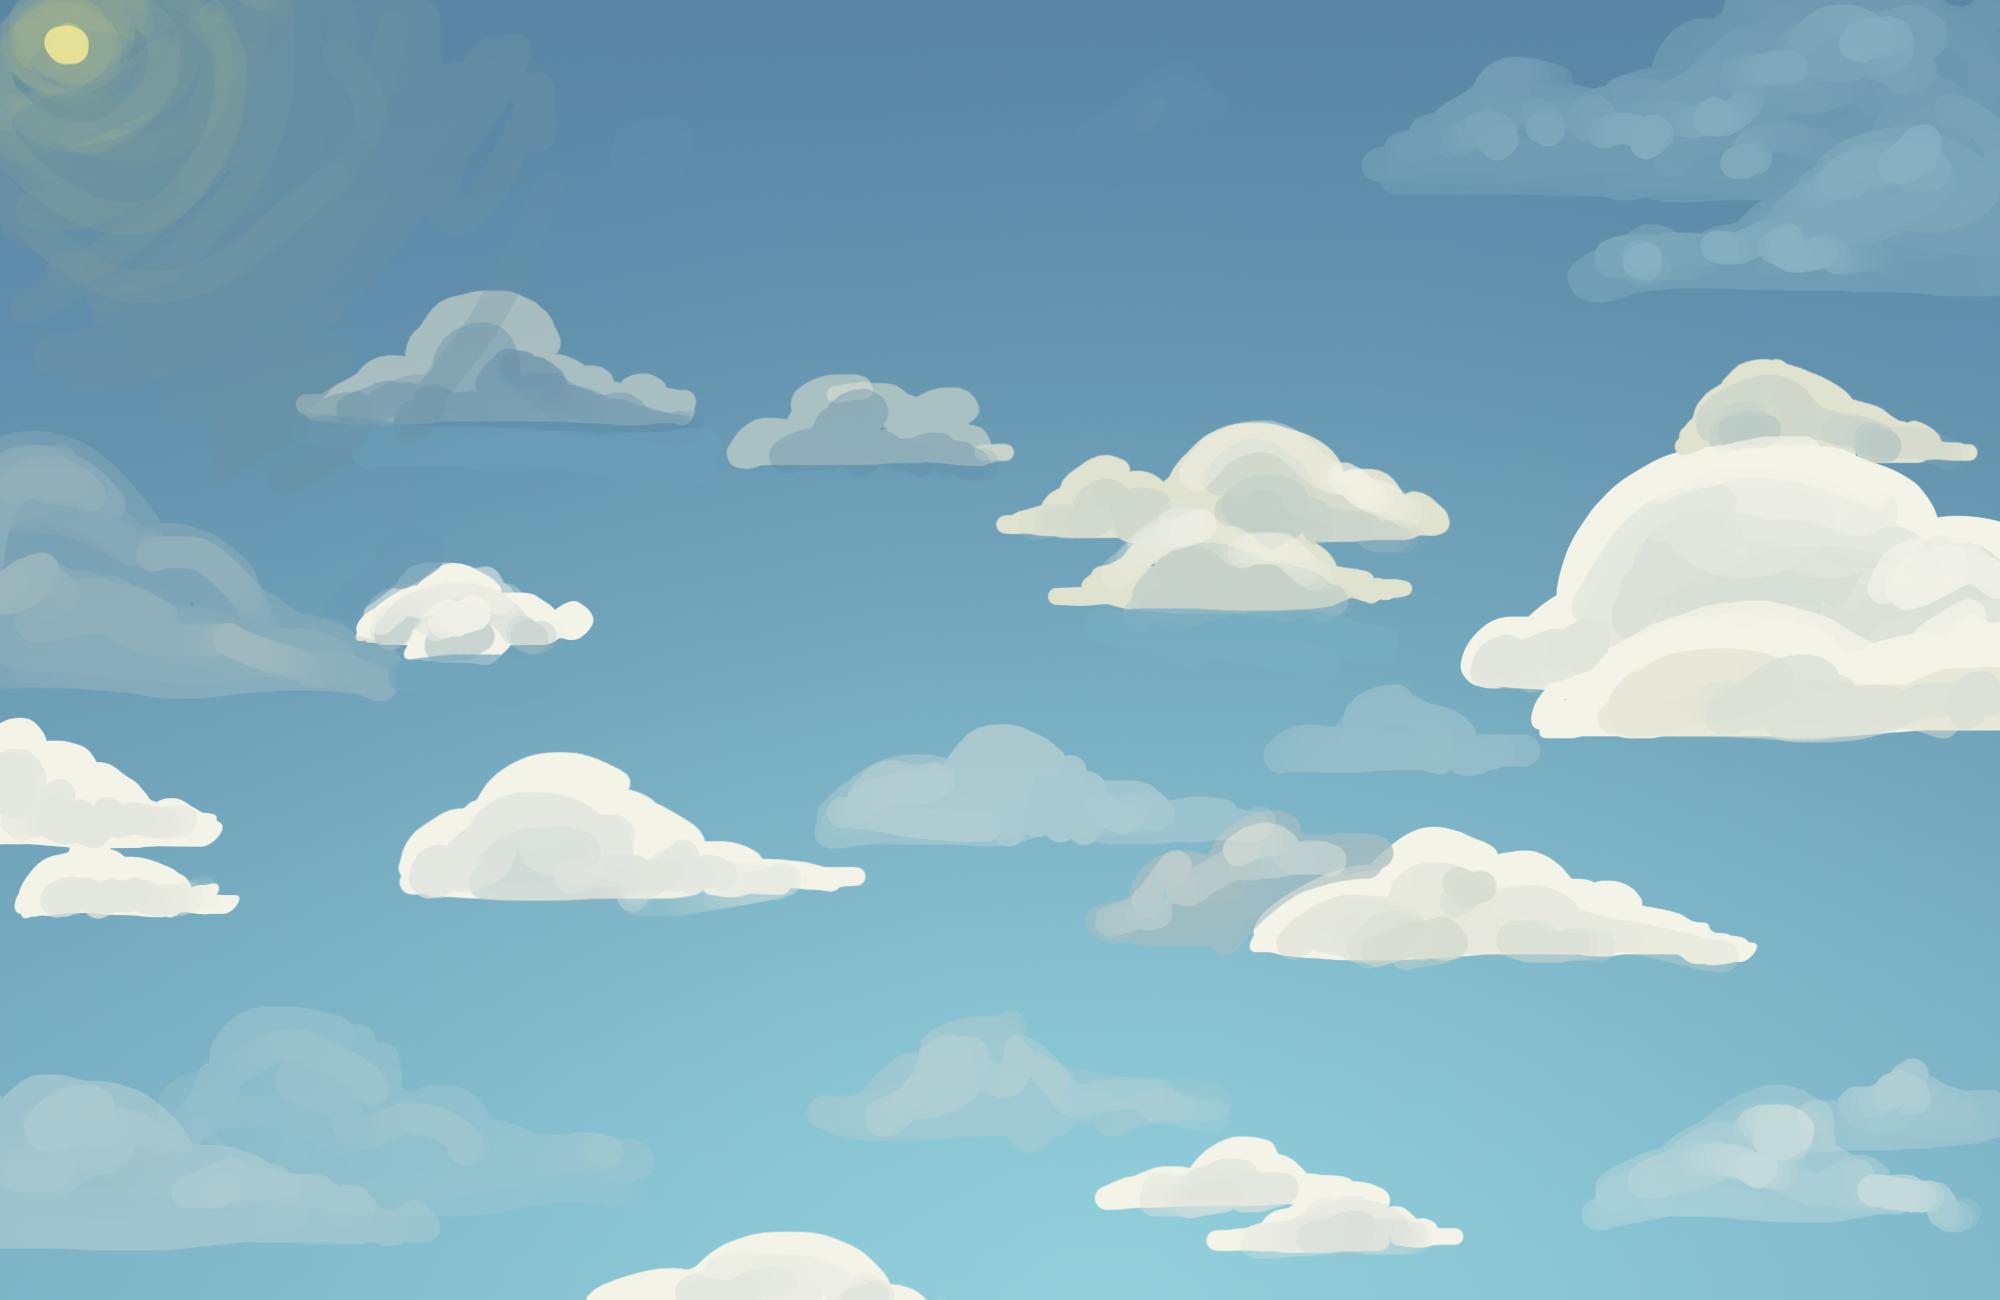 Some_clouds__sun_by_mattahan